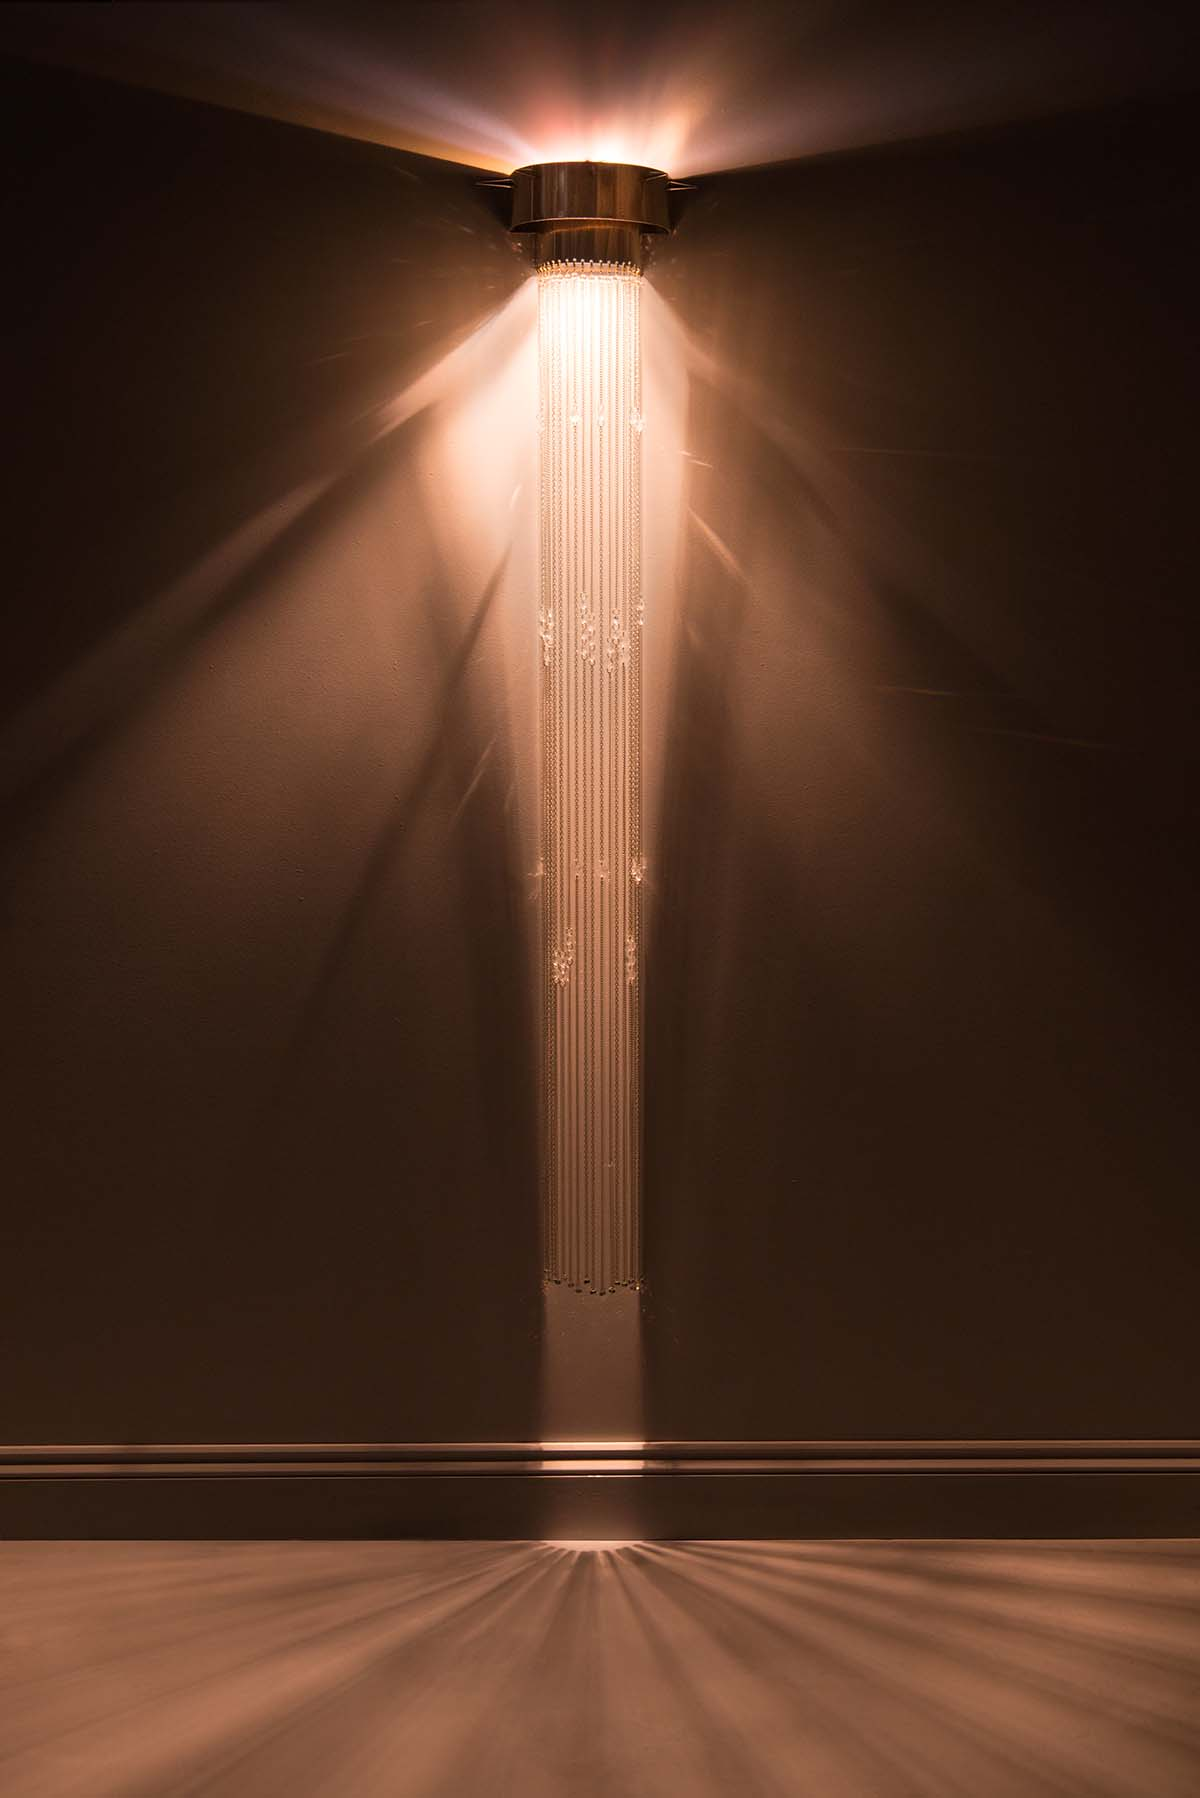 Celeste wall light by Emerald Faerie. atmospheric lighting.